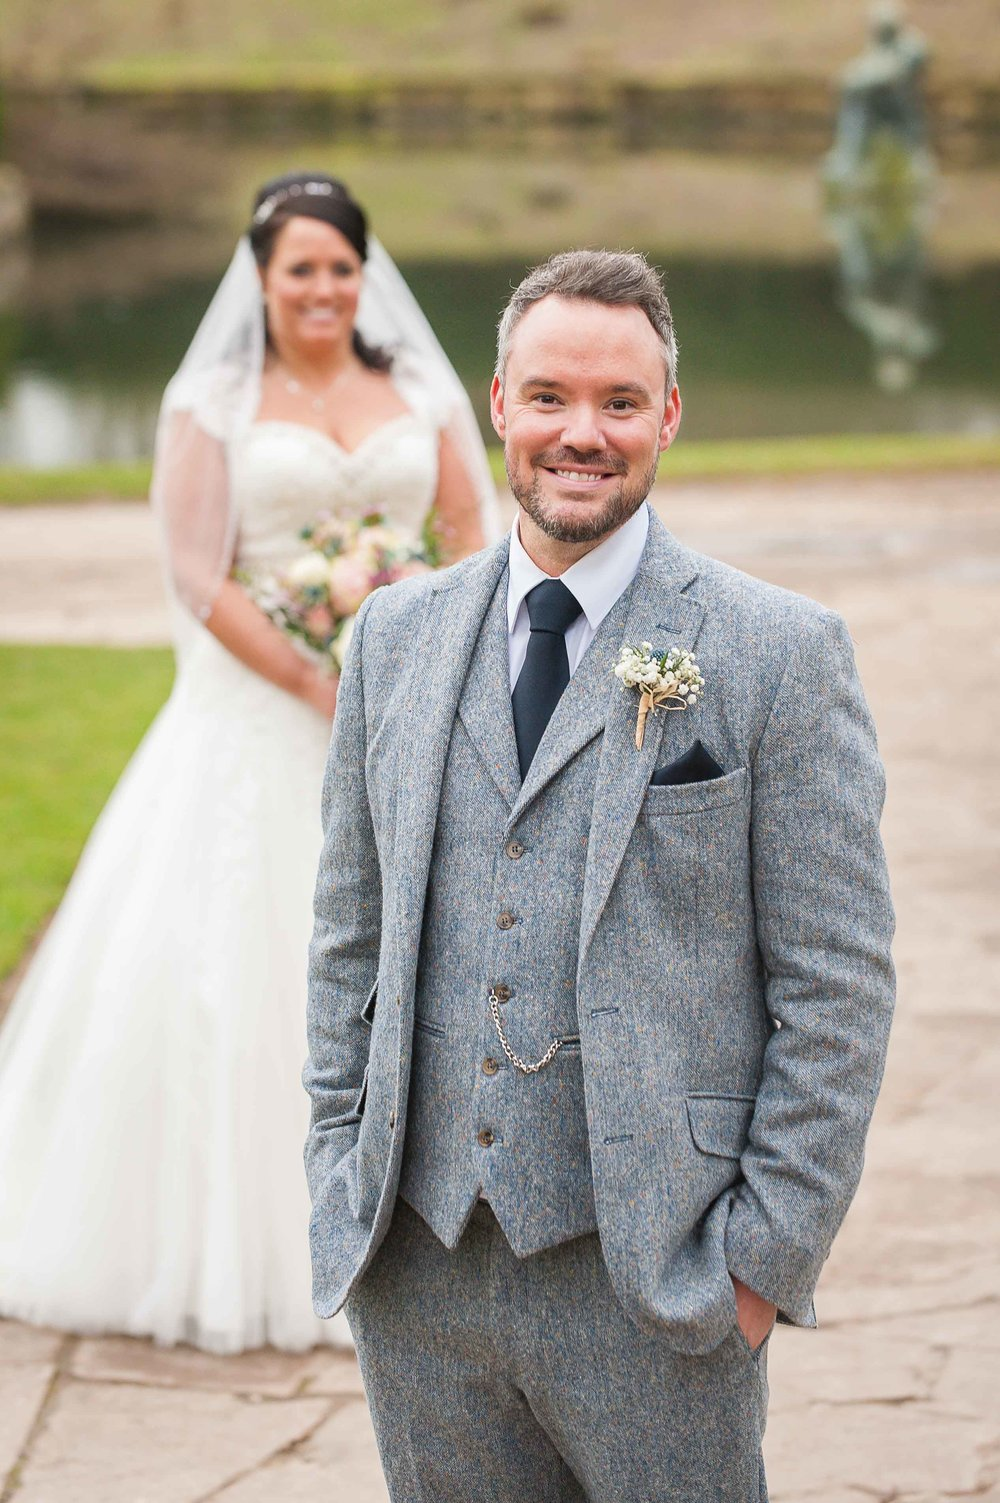 14.02.17 - Matt-Faye-Coombe-Abbey-Valentine-Wedding-Charnwood-Photography-1064.jpg